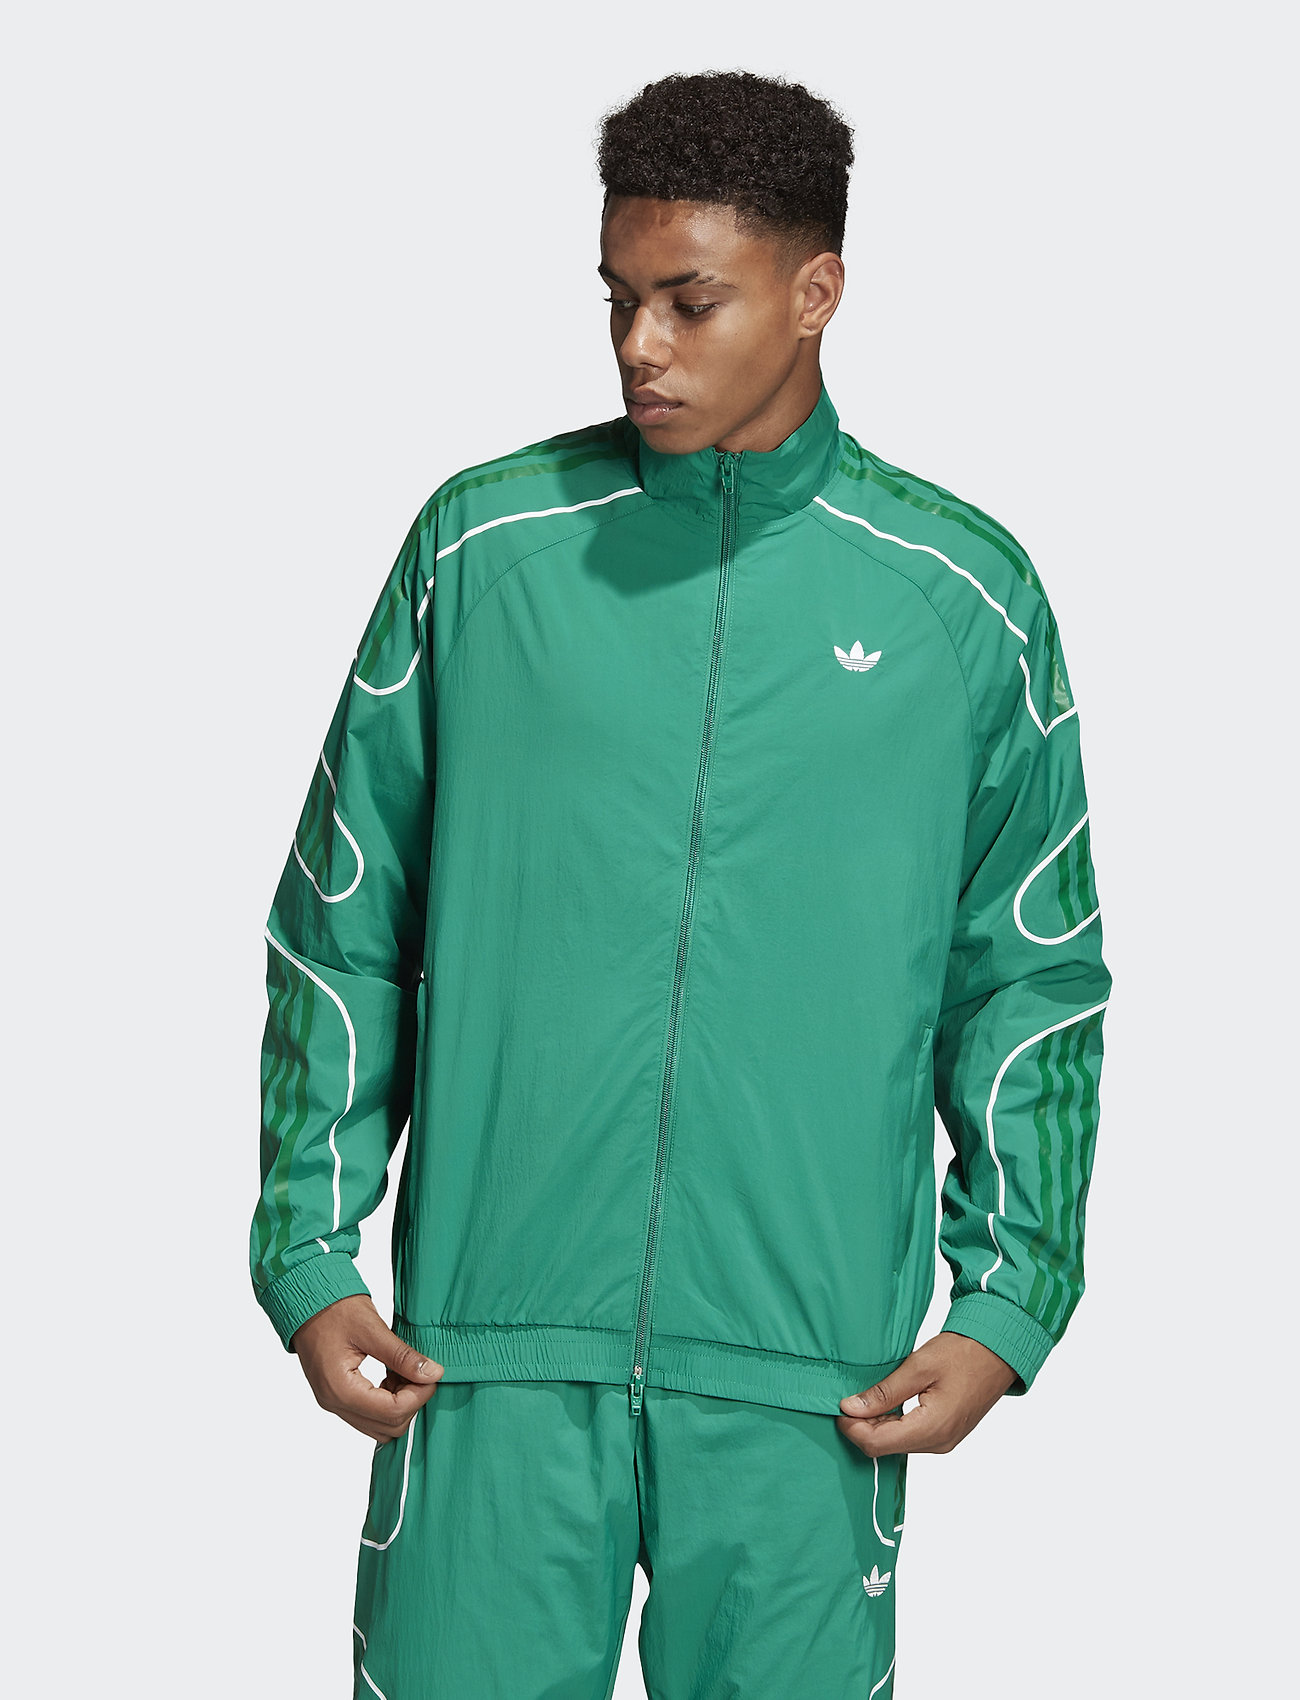 Encantador pub Abolladura  Flamestrk Wv Tt (Bgreen) (35.98 €) - adidas Originals - | Boozt.com